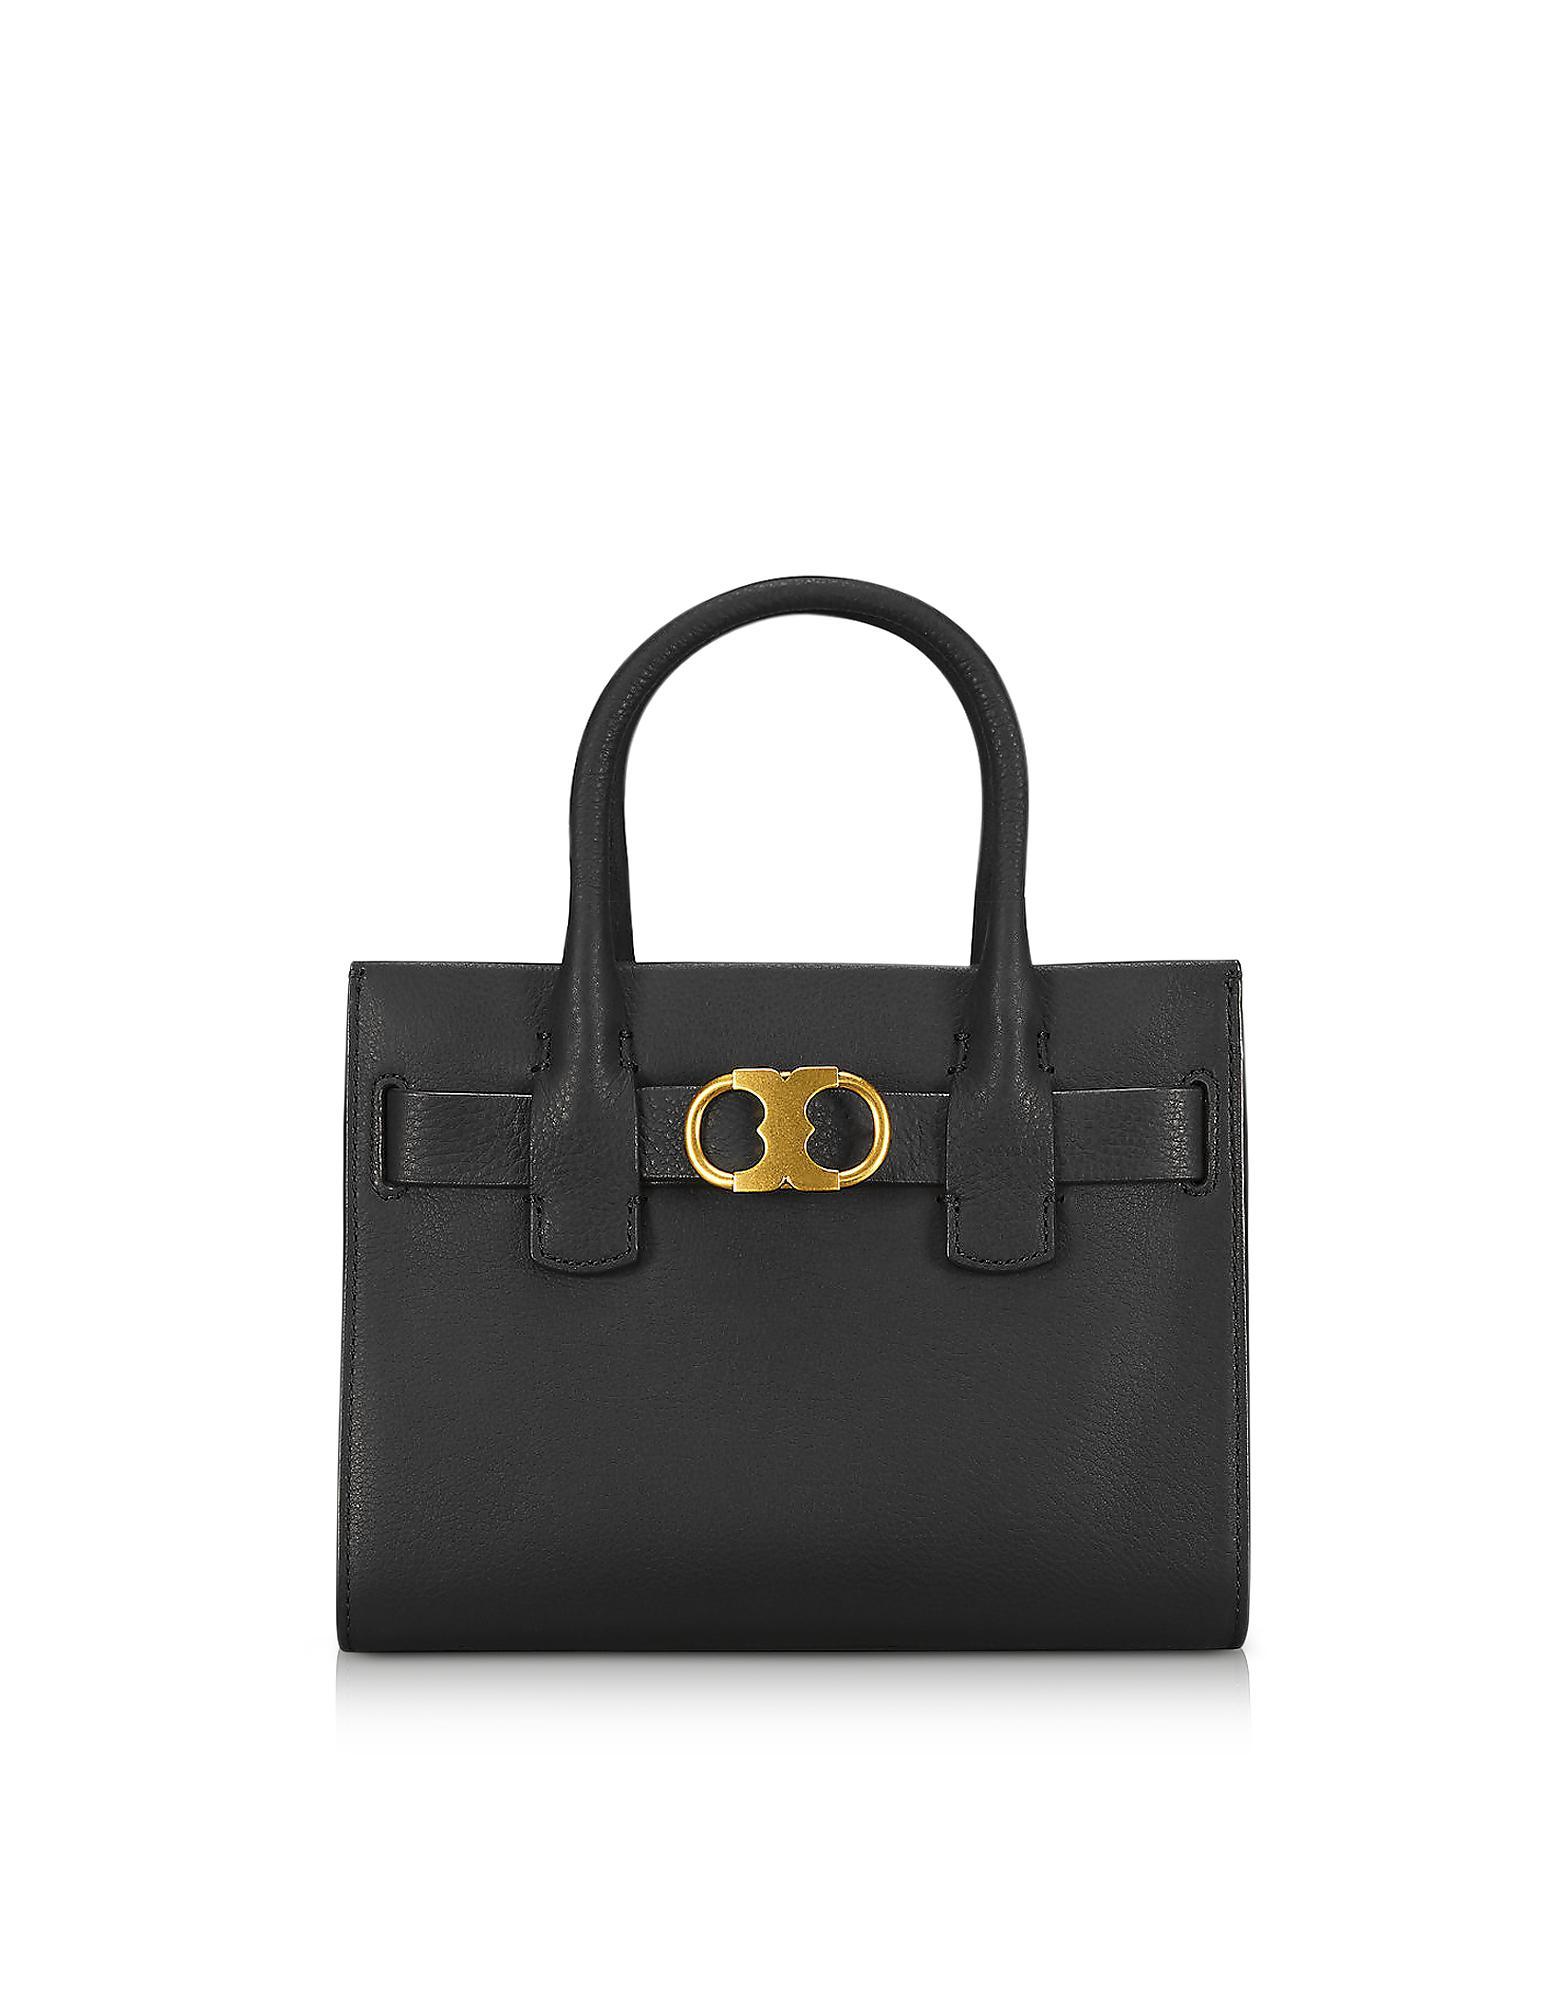 0b8c8ff17 Tory Burch Gemini Link Black Leather Small Tote Bag in Black - Lyst